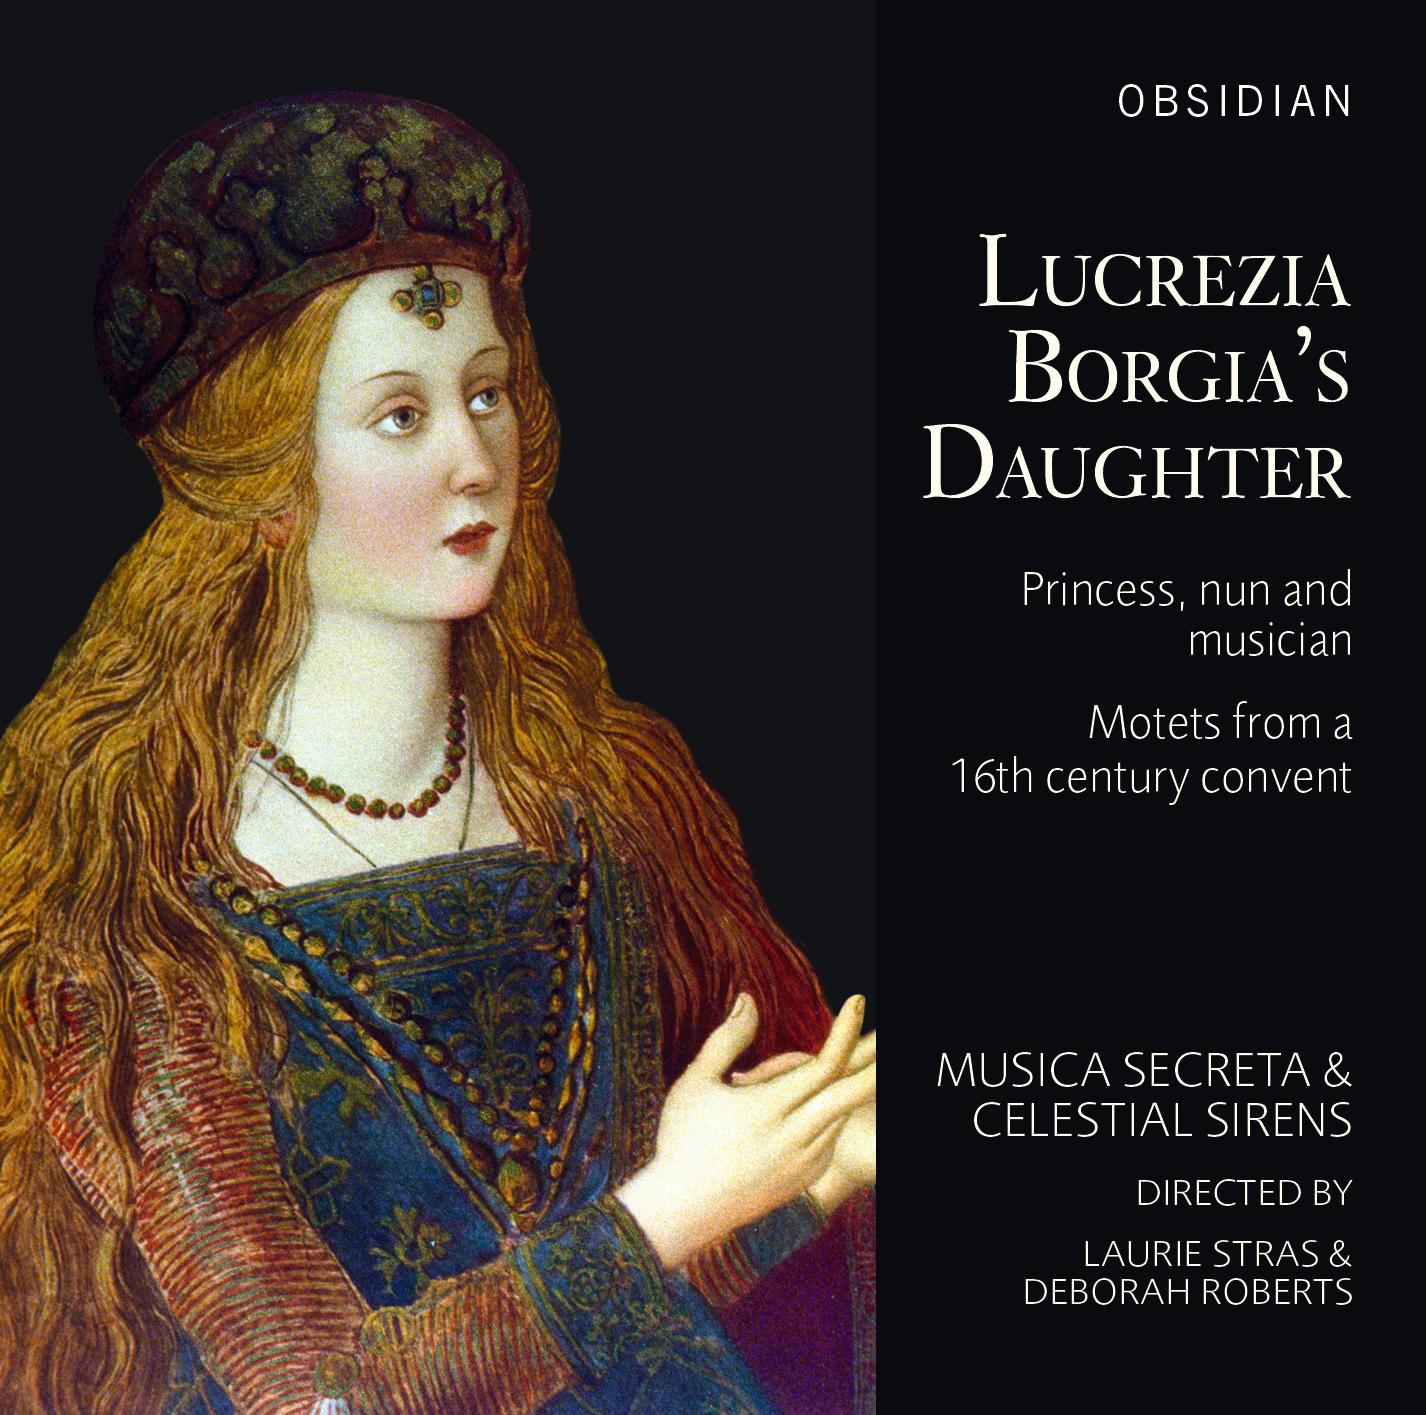 CD71x Lucrezias Daughter cover hi res.jpg